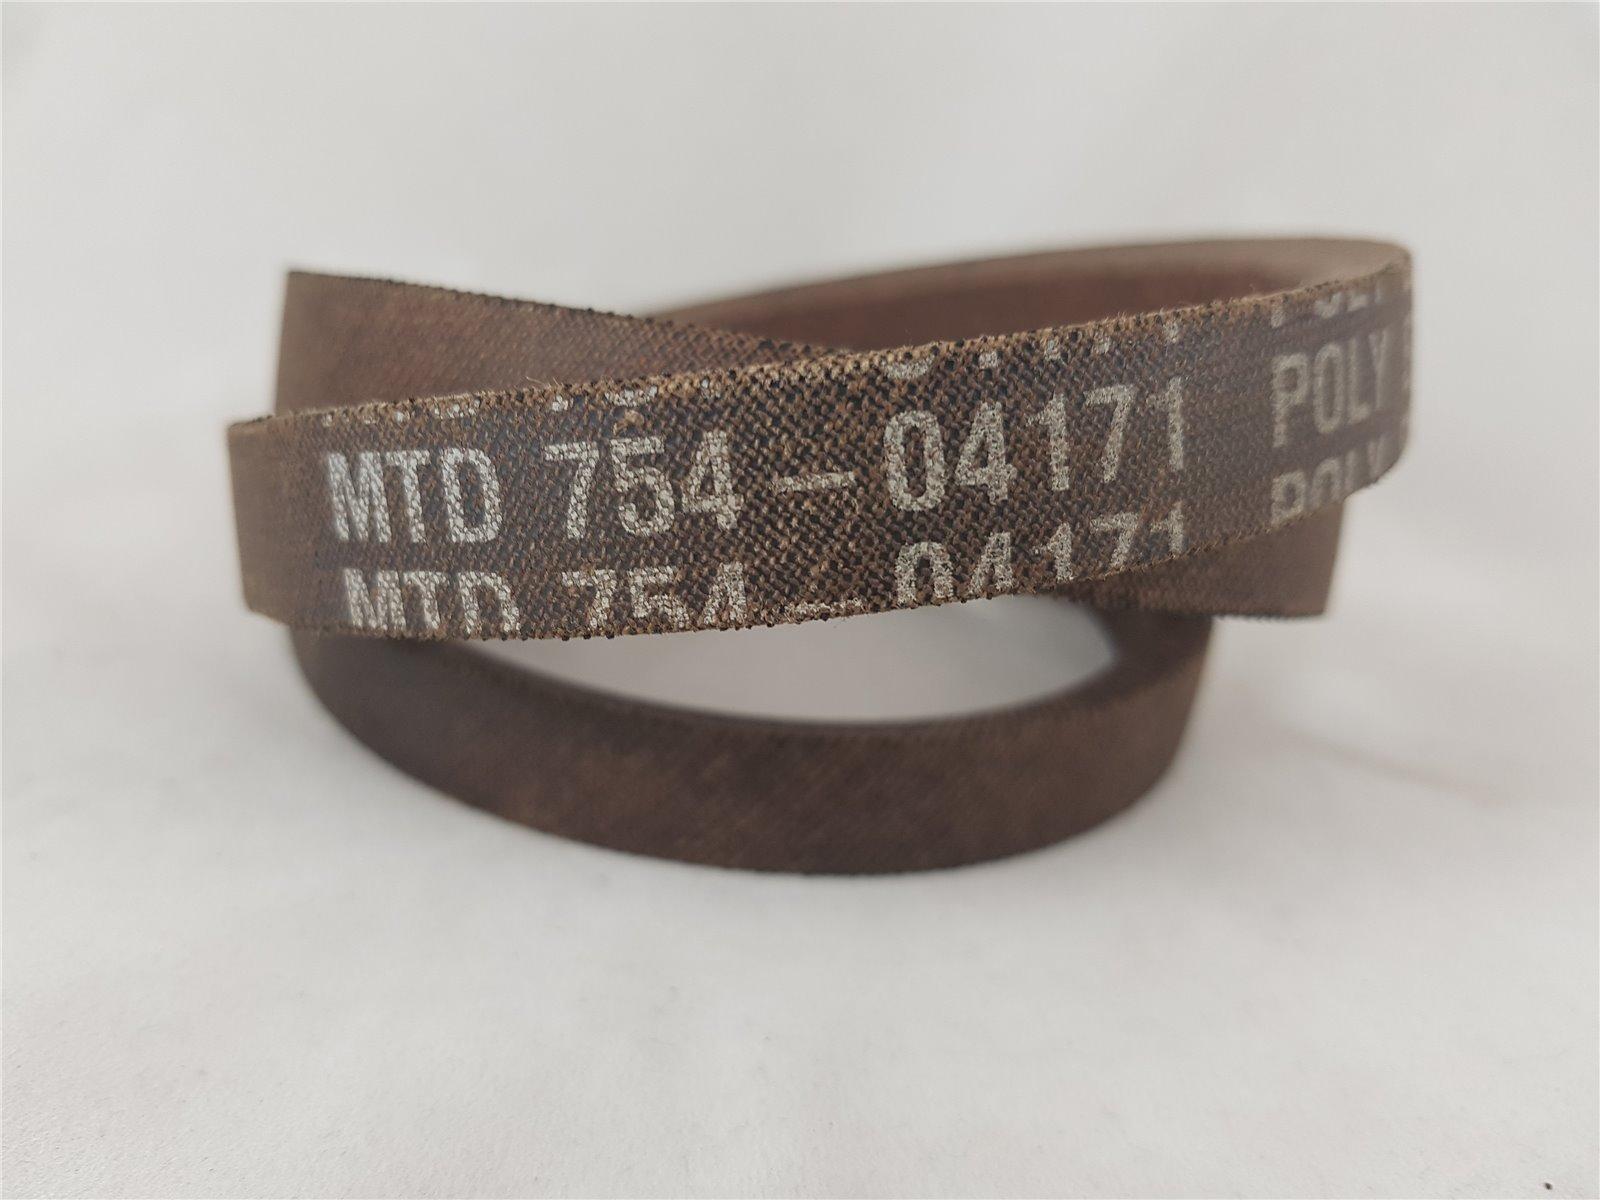 MTD Keilriemen Rasentraktor Mastercut Fahrantrieb Aufsitzmäher 754-04268 orig